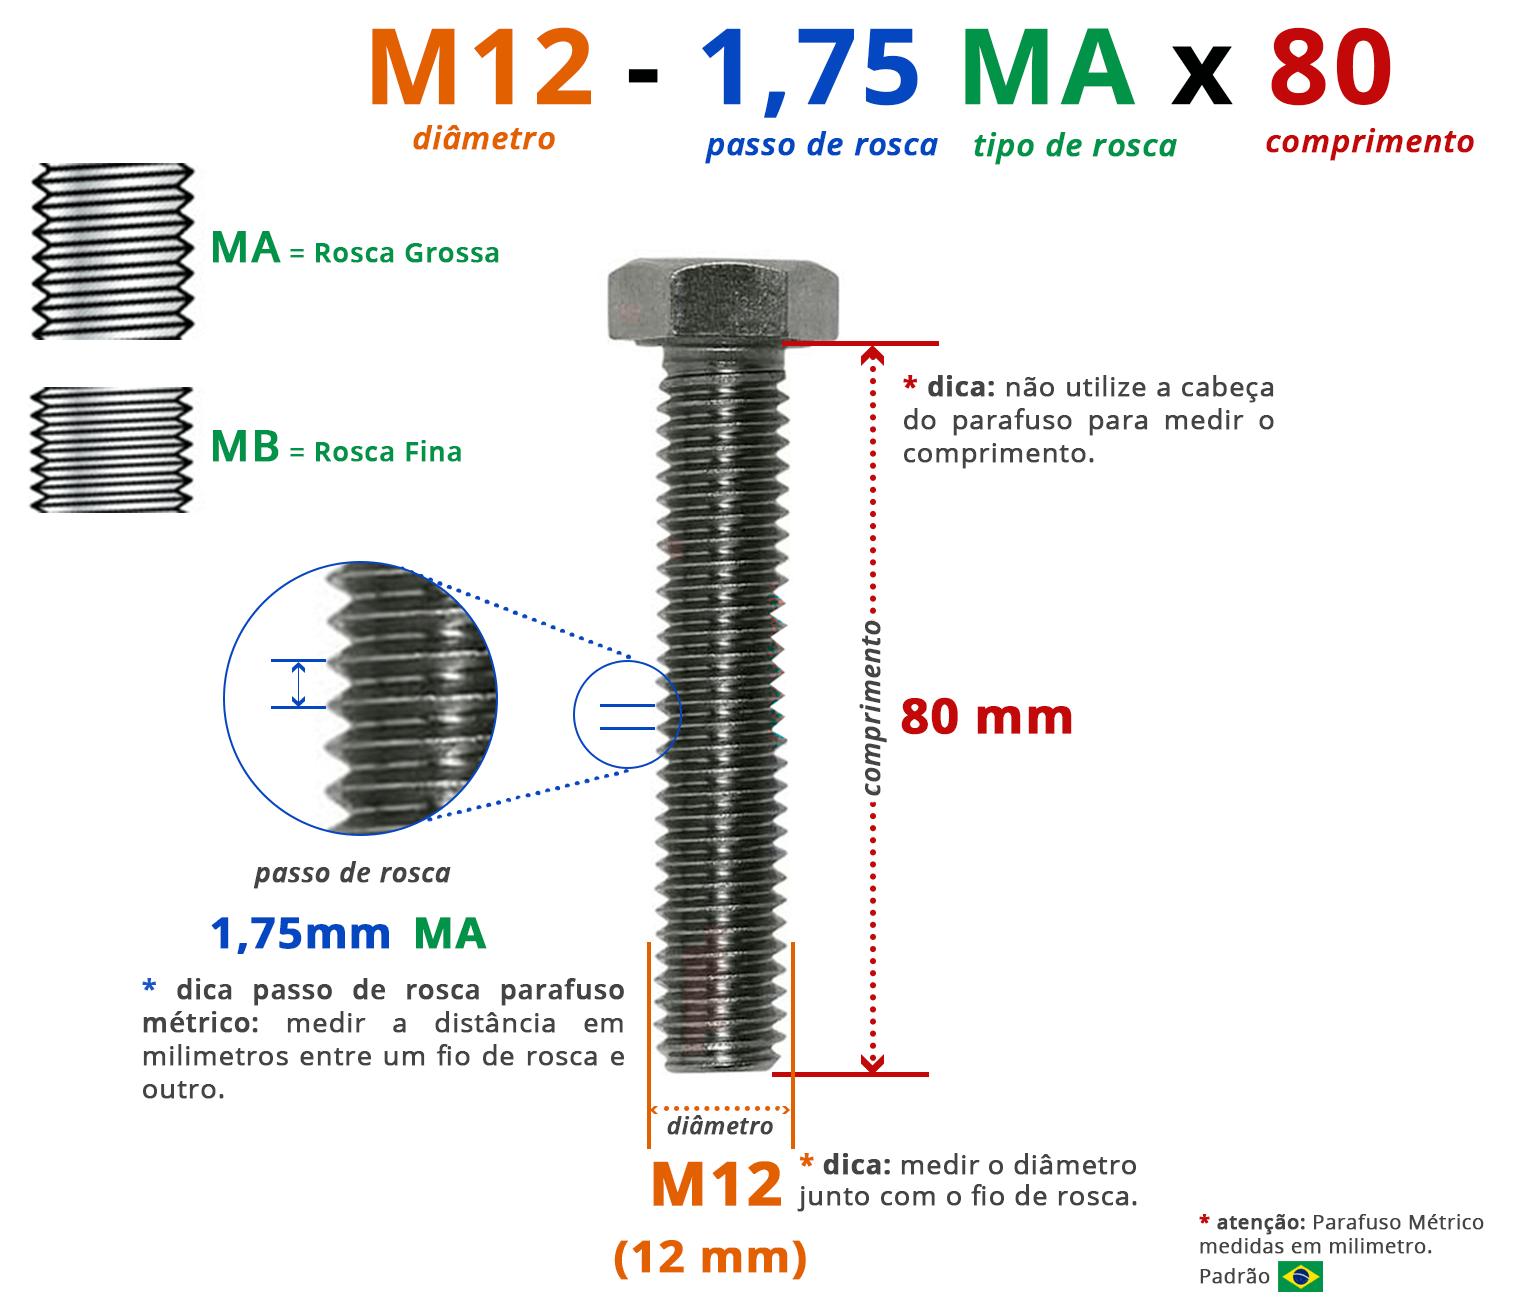 PARAFUSO SEXTAVADO ROSCA INTEIRA M12 1,75 MA X 80 DIN 933 INOX A4